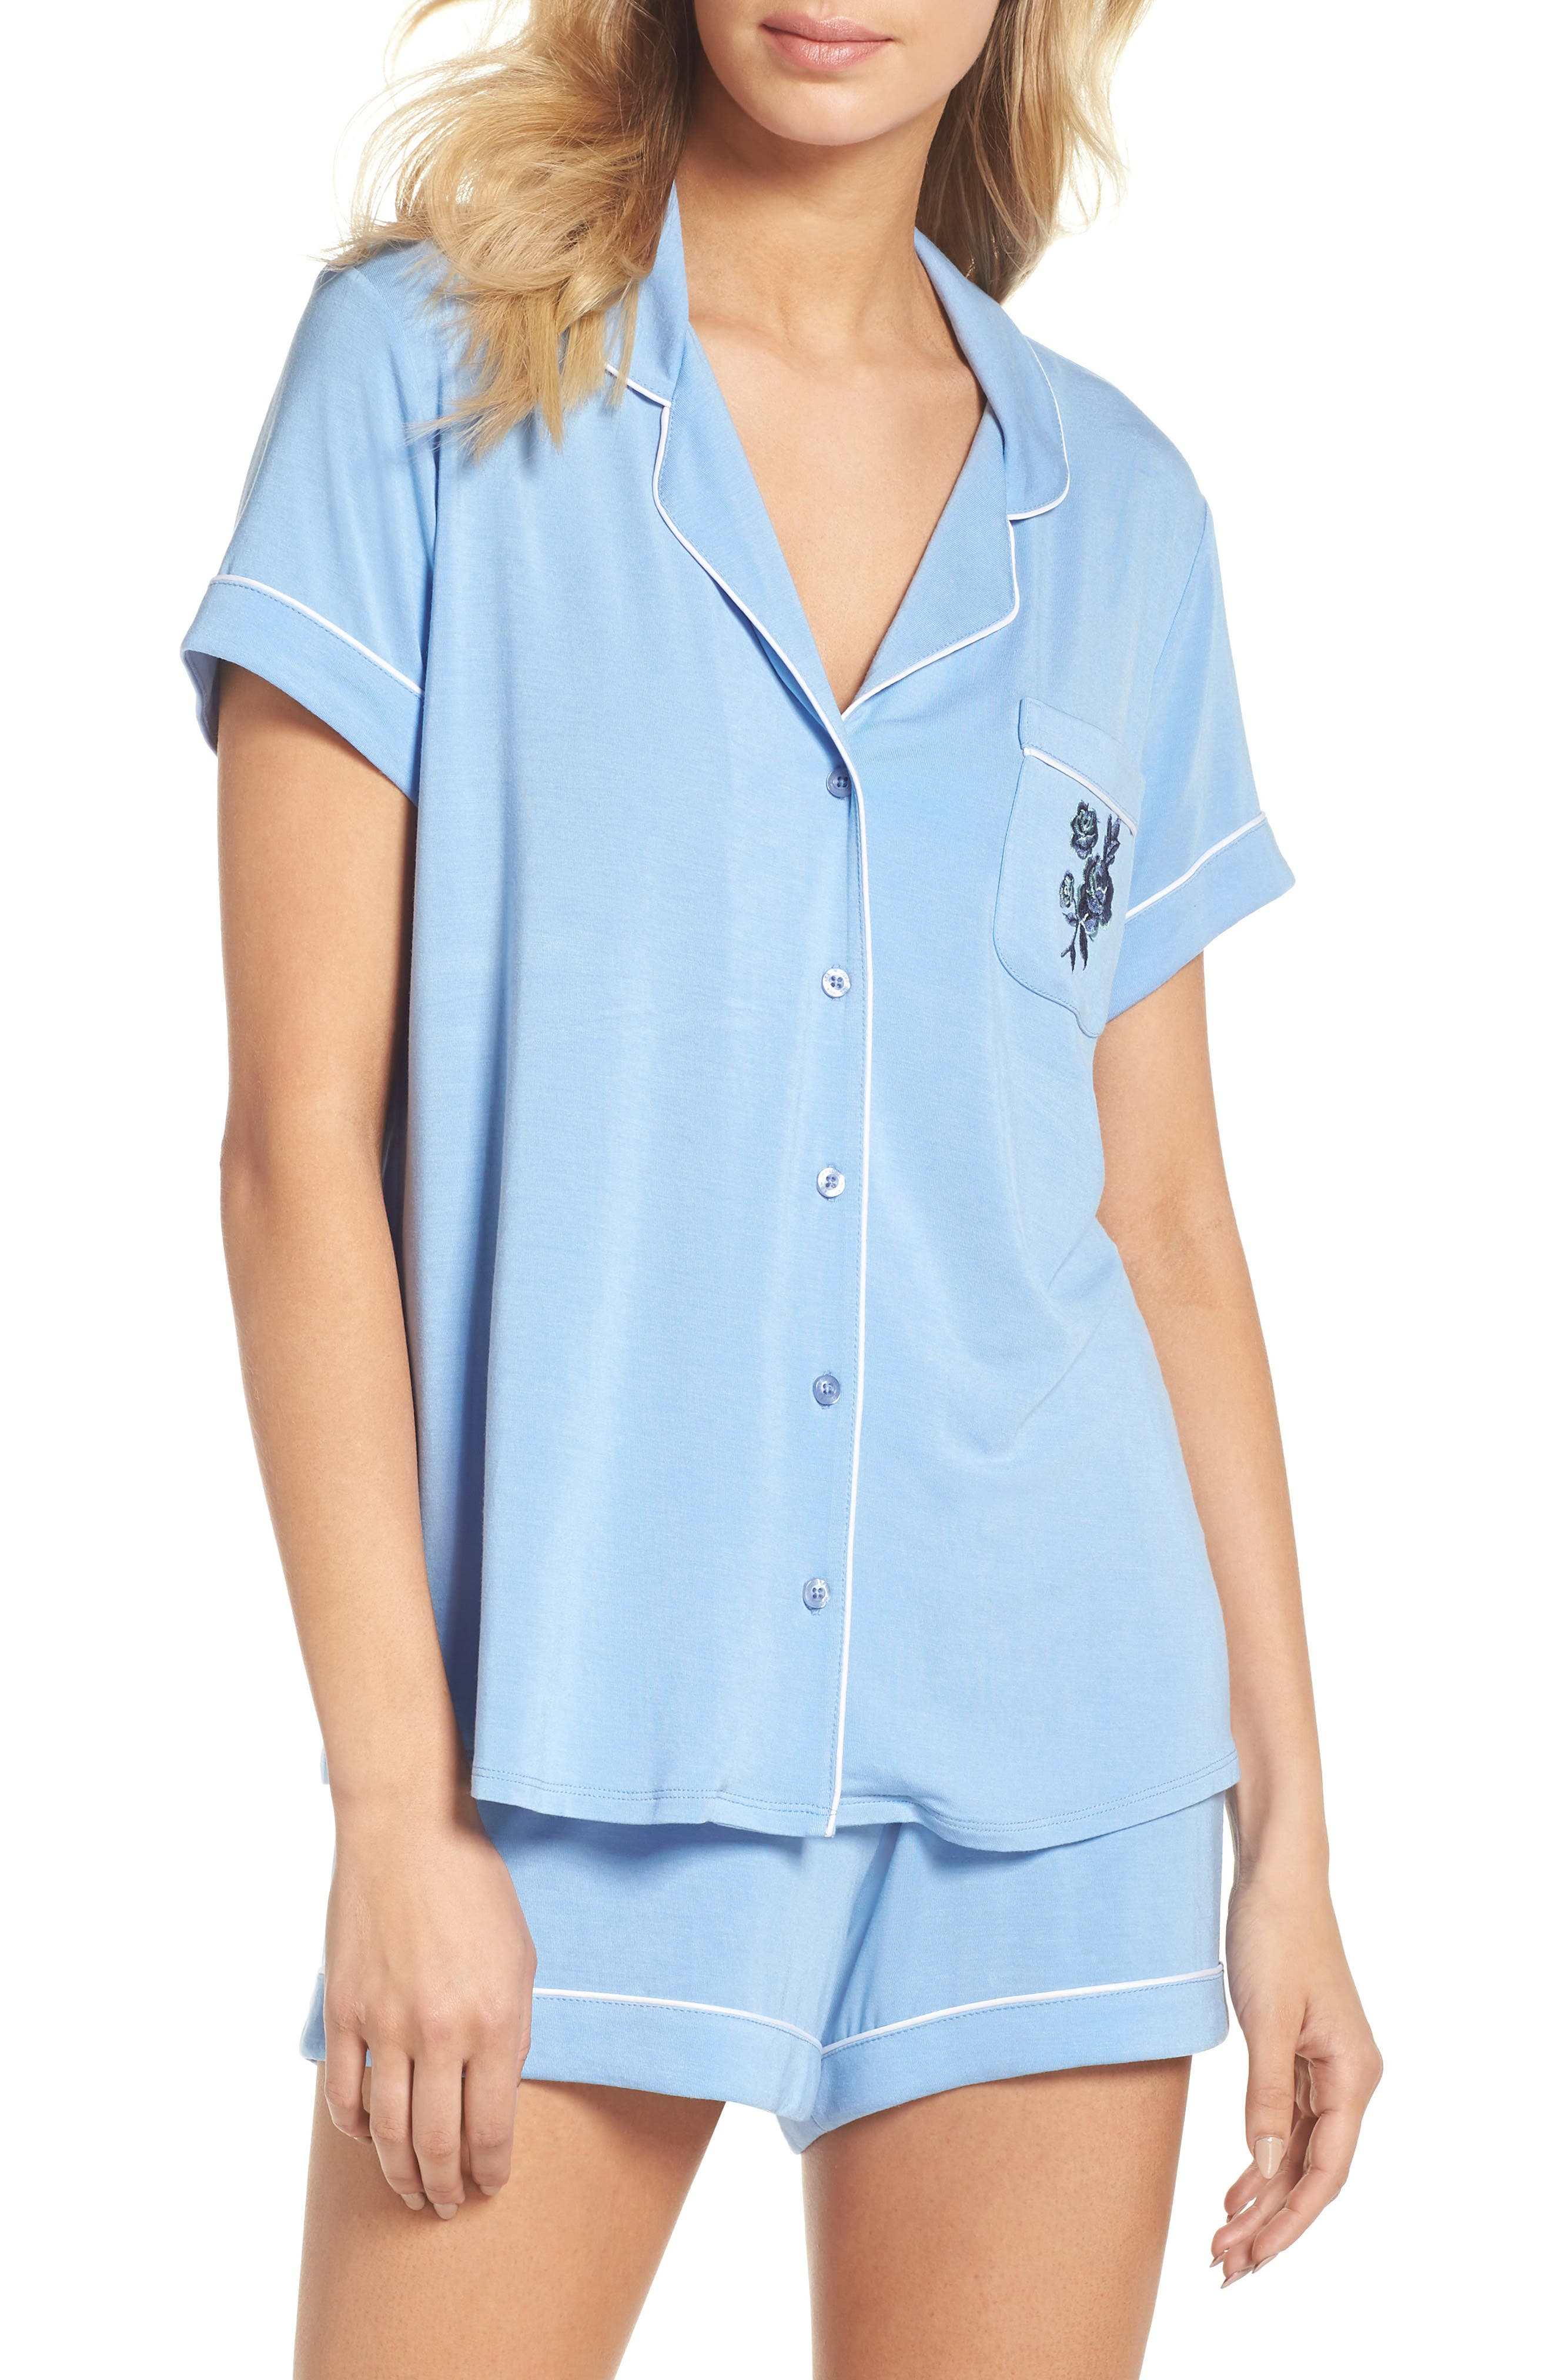 Moonlight Shortie Pajamas,                         Main,                         color, 421